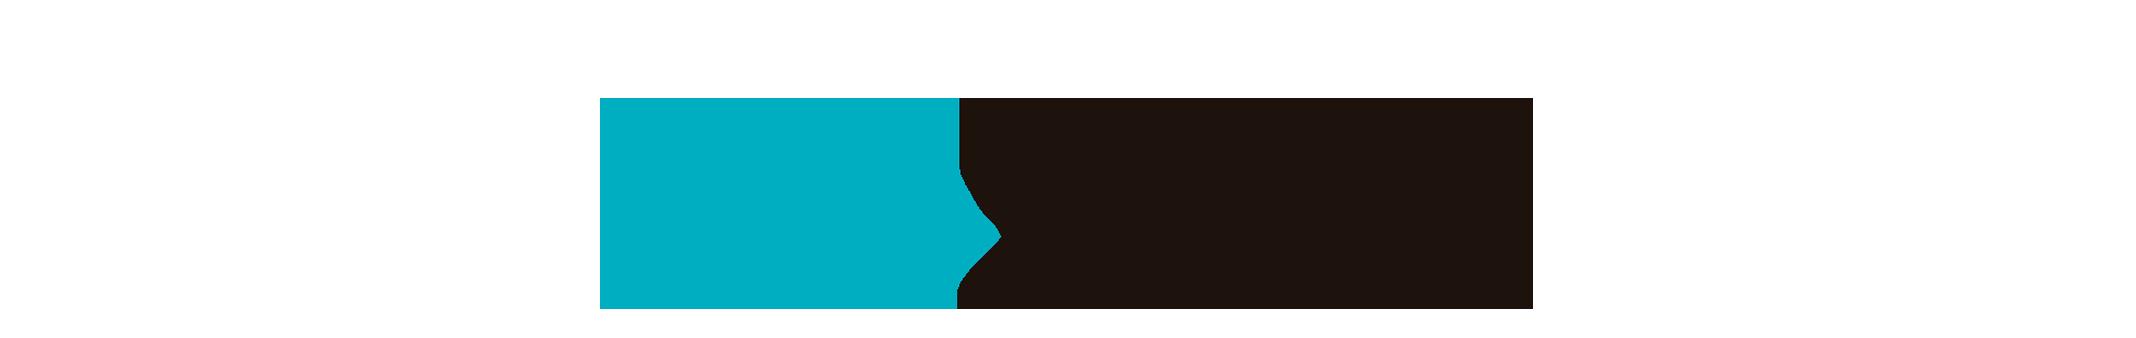 Logo estela